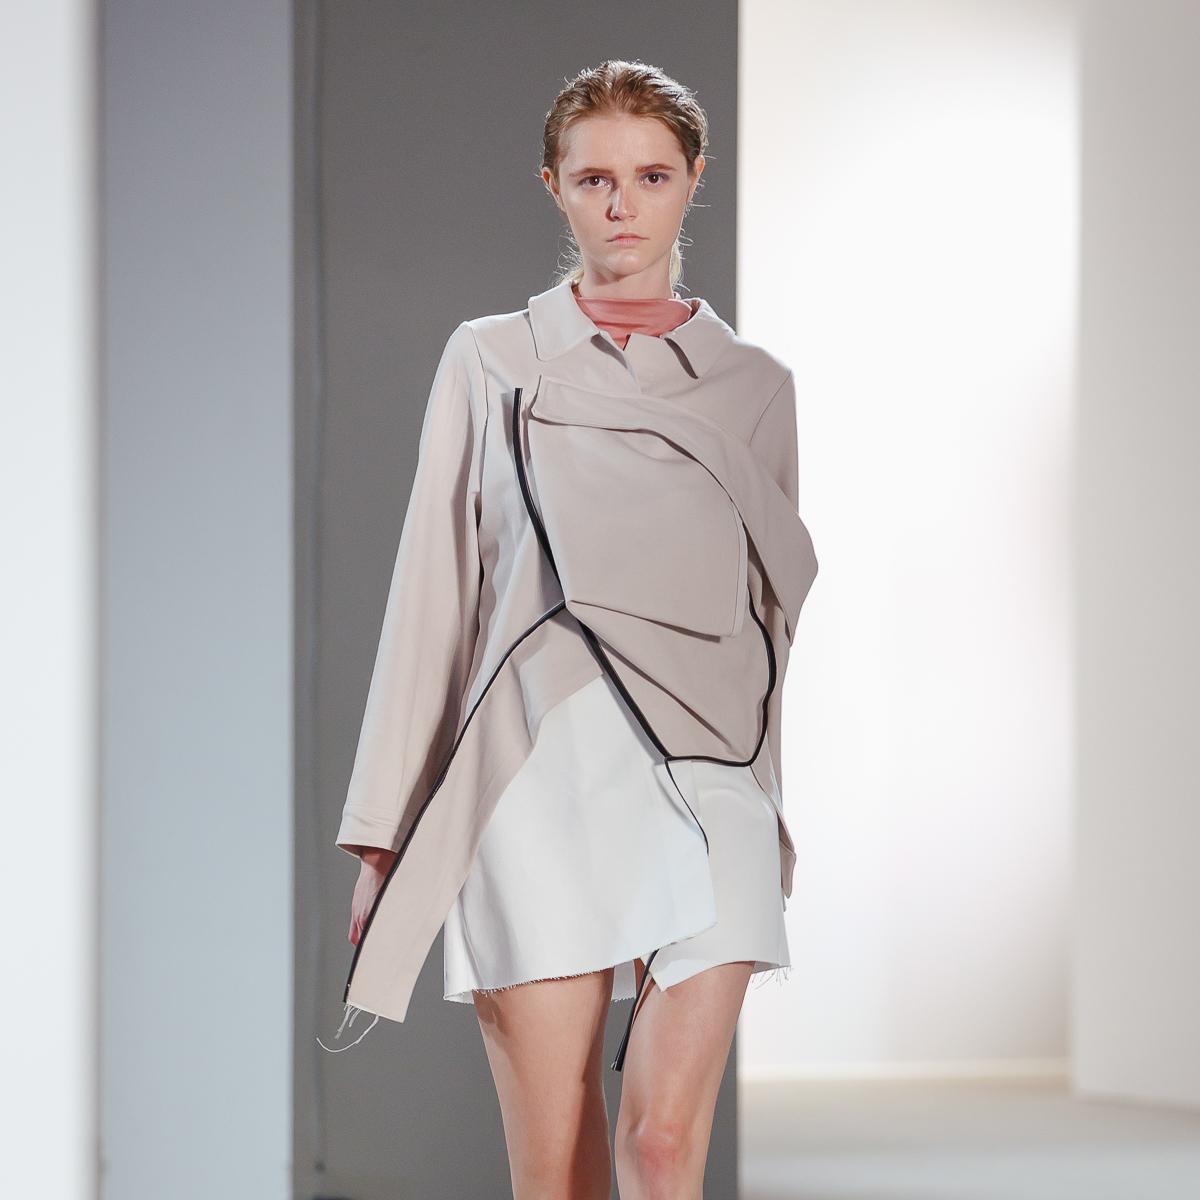 Vladimir Karaleev Show Fashion Week Berlin 2017-5